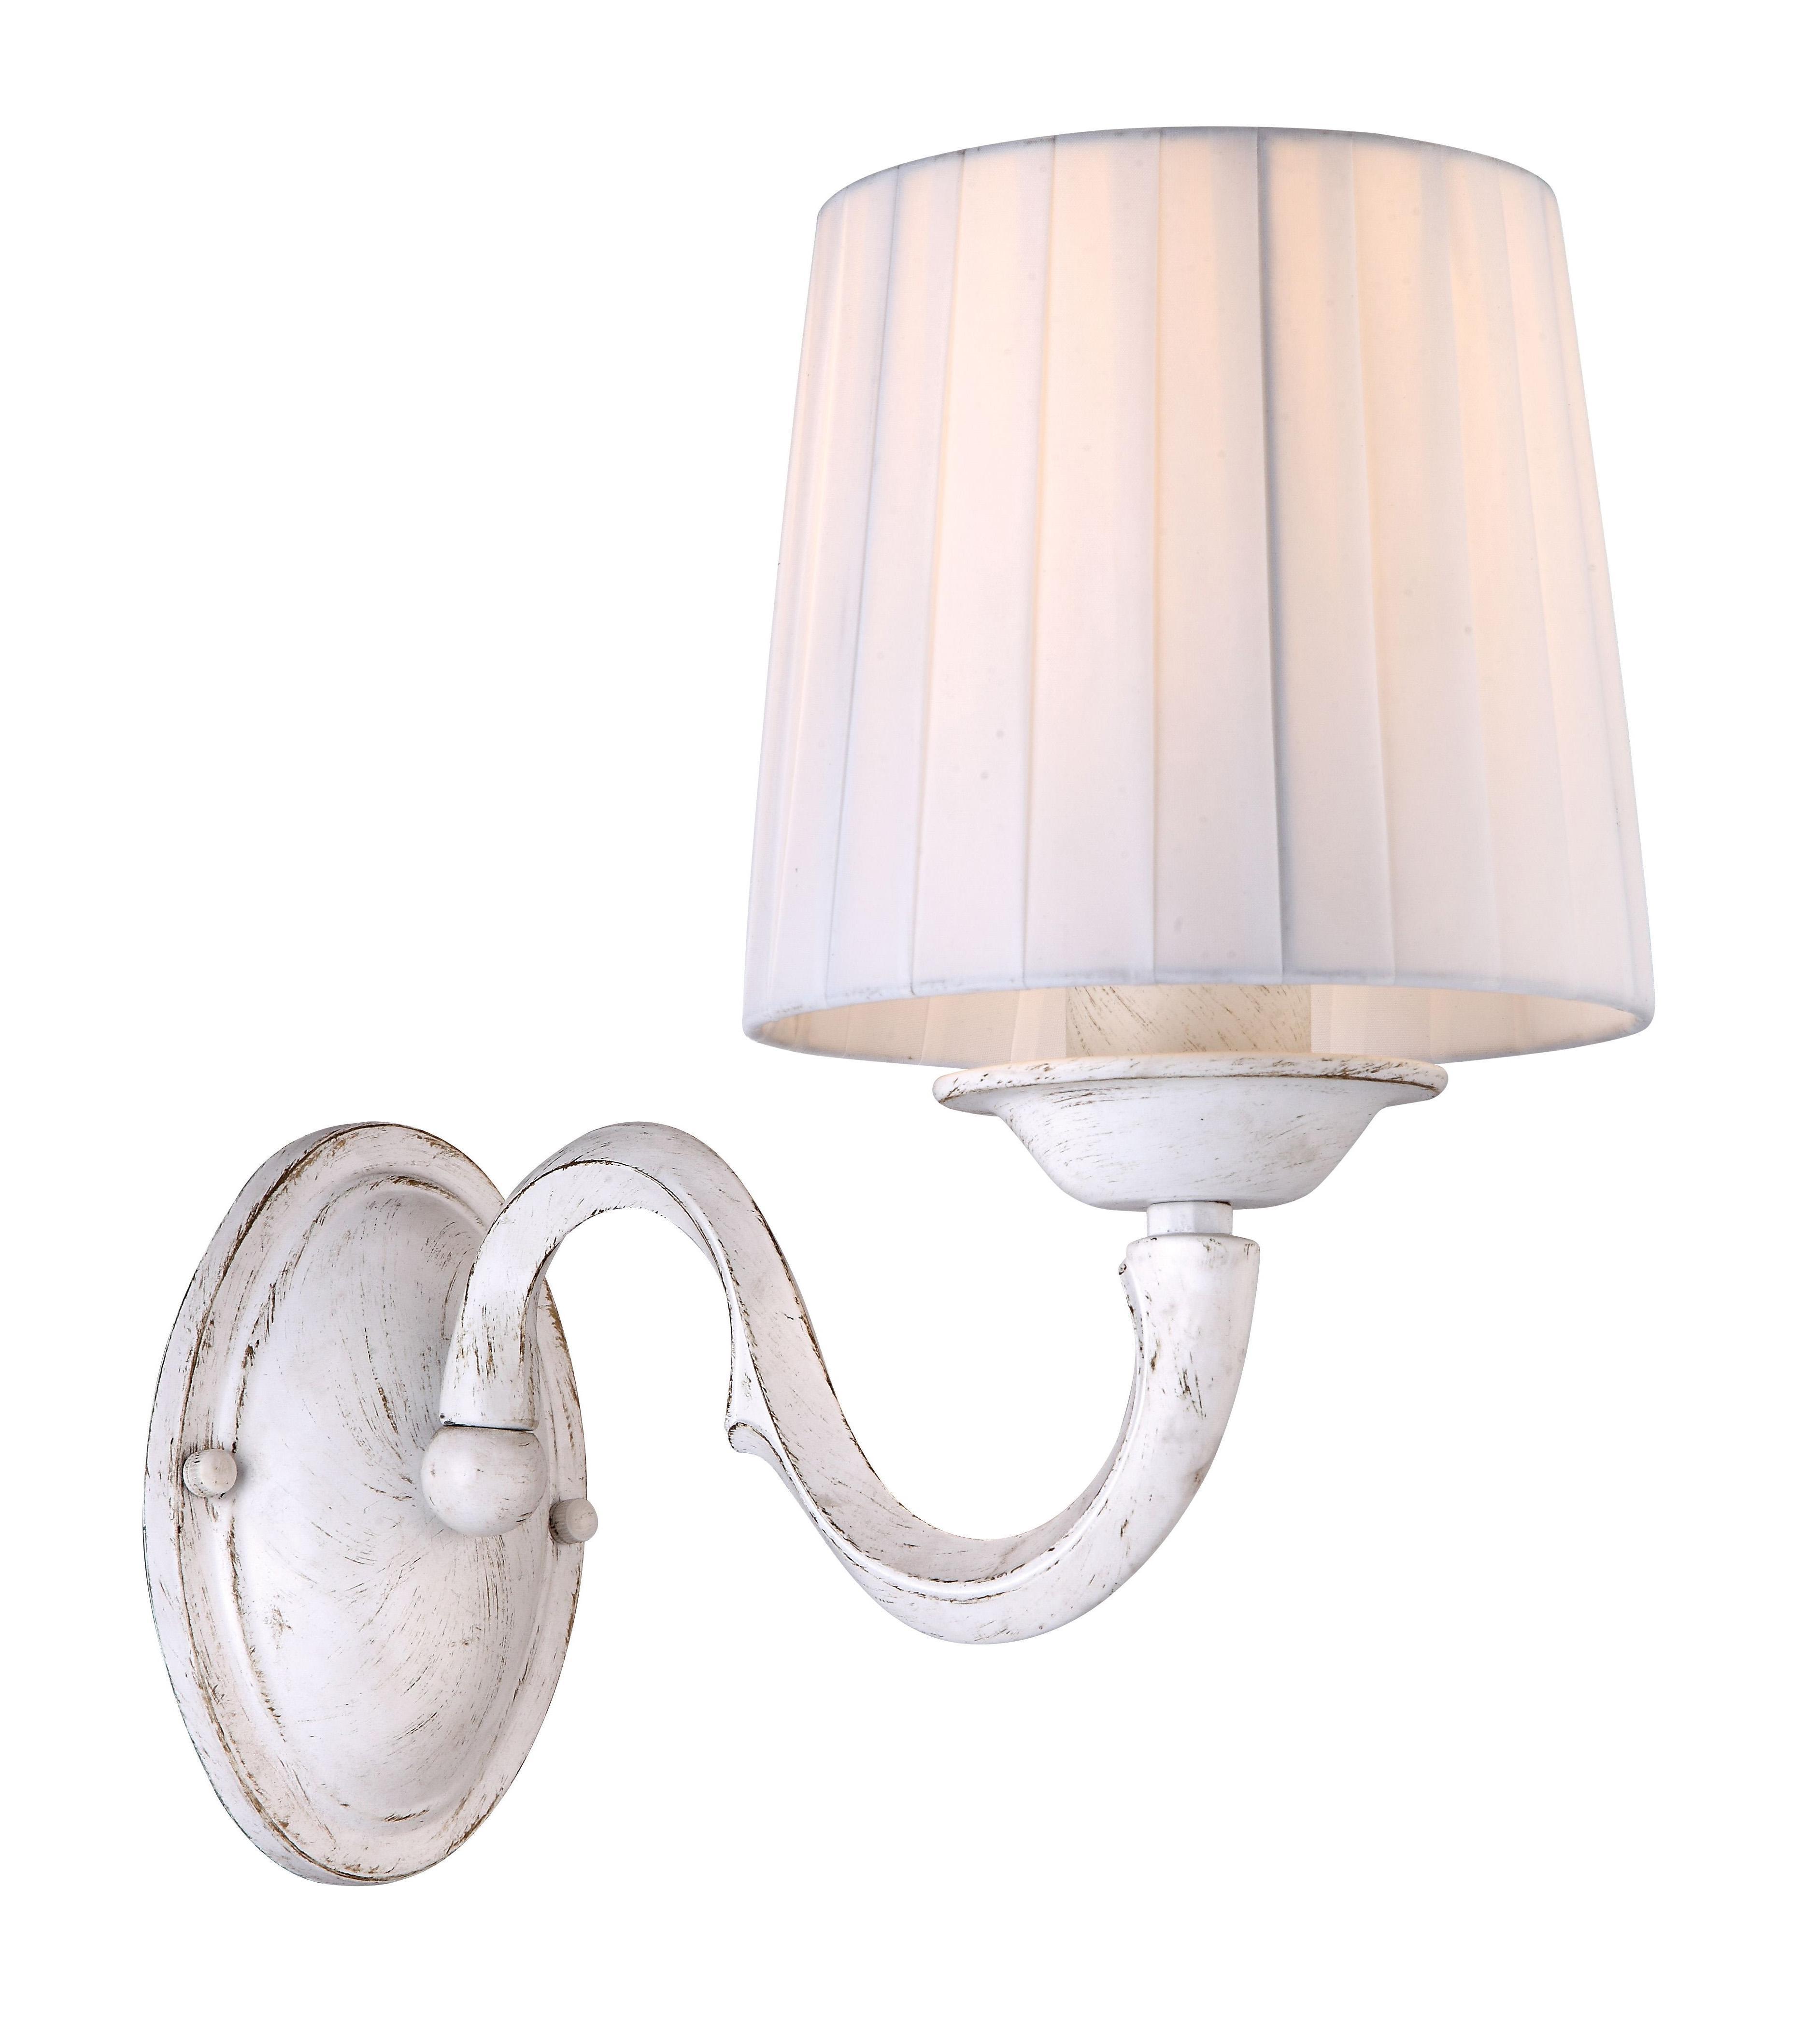 Бра Arte lamp A9395ap-1wg бра 8111 01 ap 1 divinare